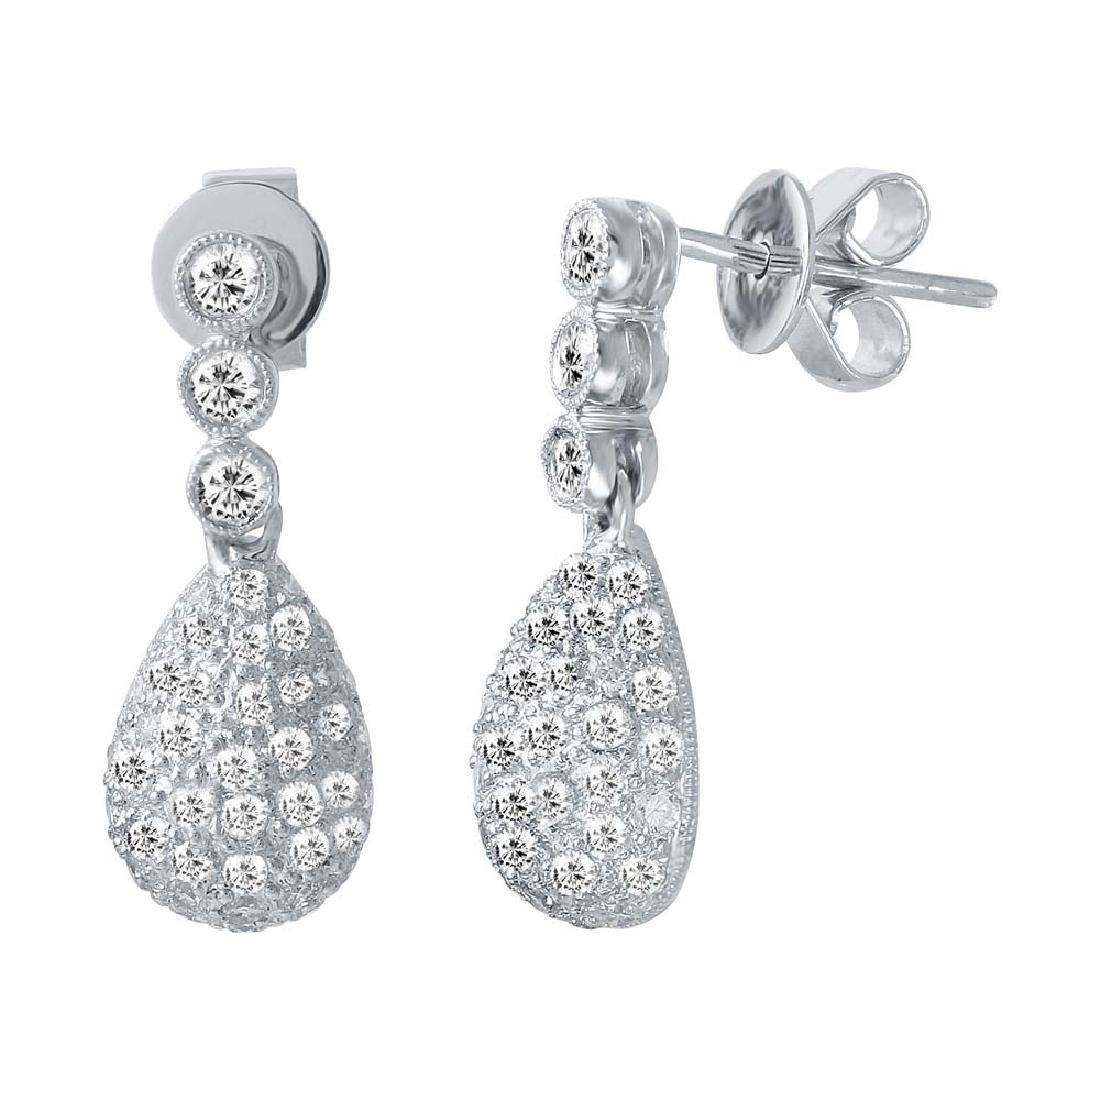 Genuine 1.2 TCW 18K White Gold Ladies Earring